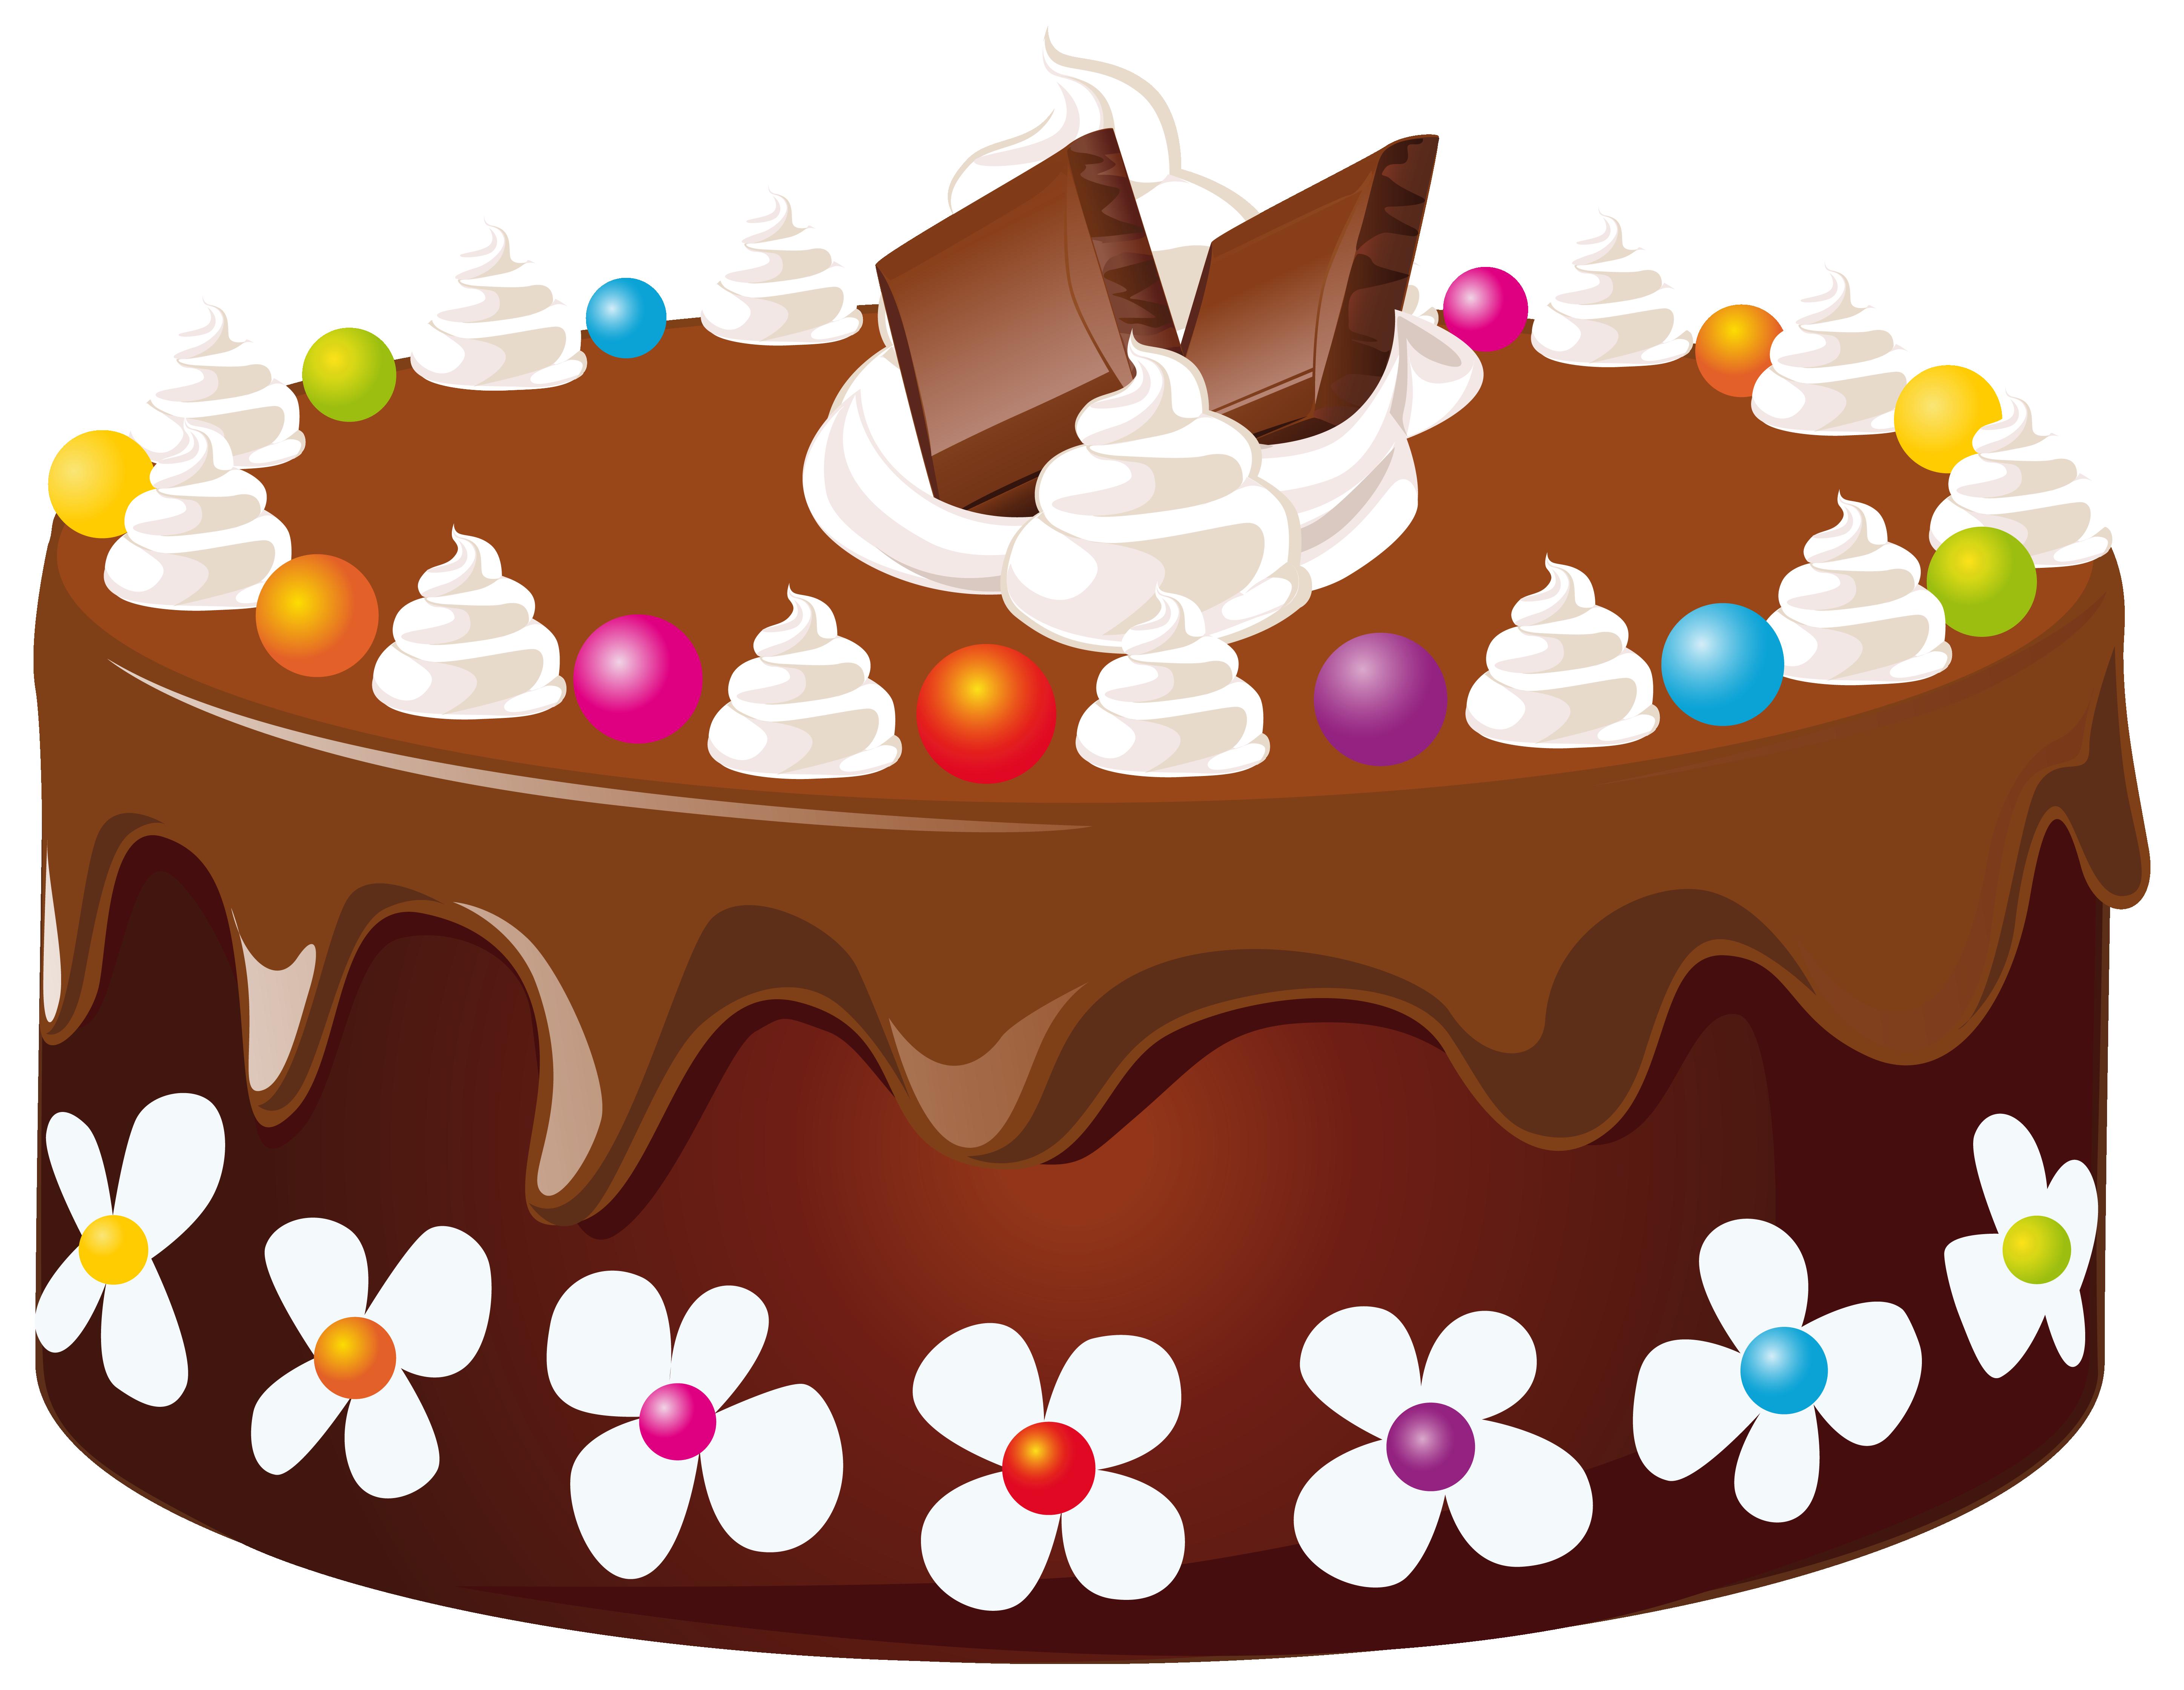 Chocolate cake clipart - .